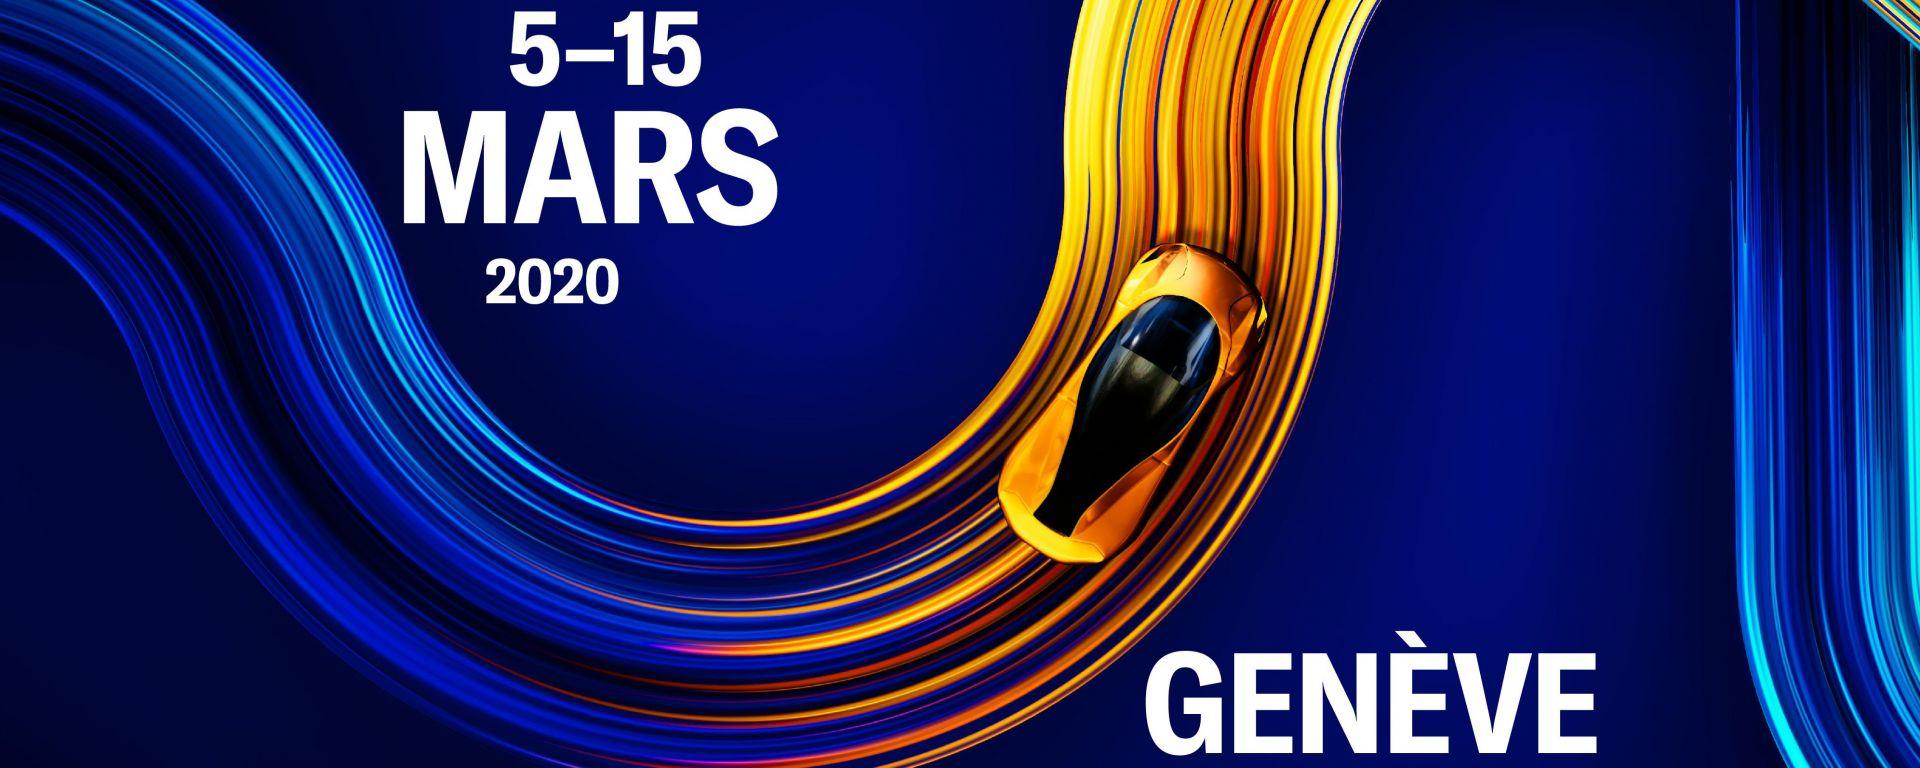 Salone di Ginevra 2020: la locandina